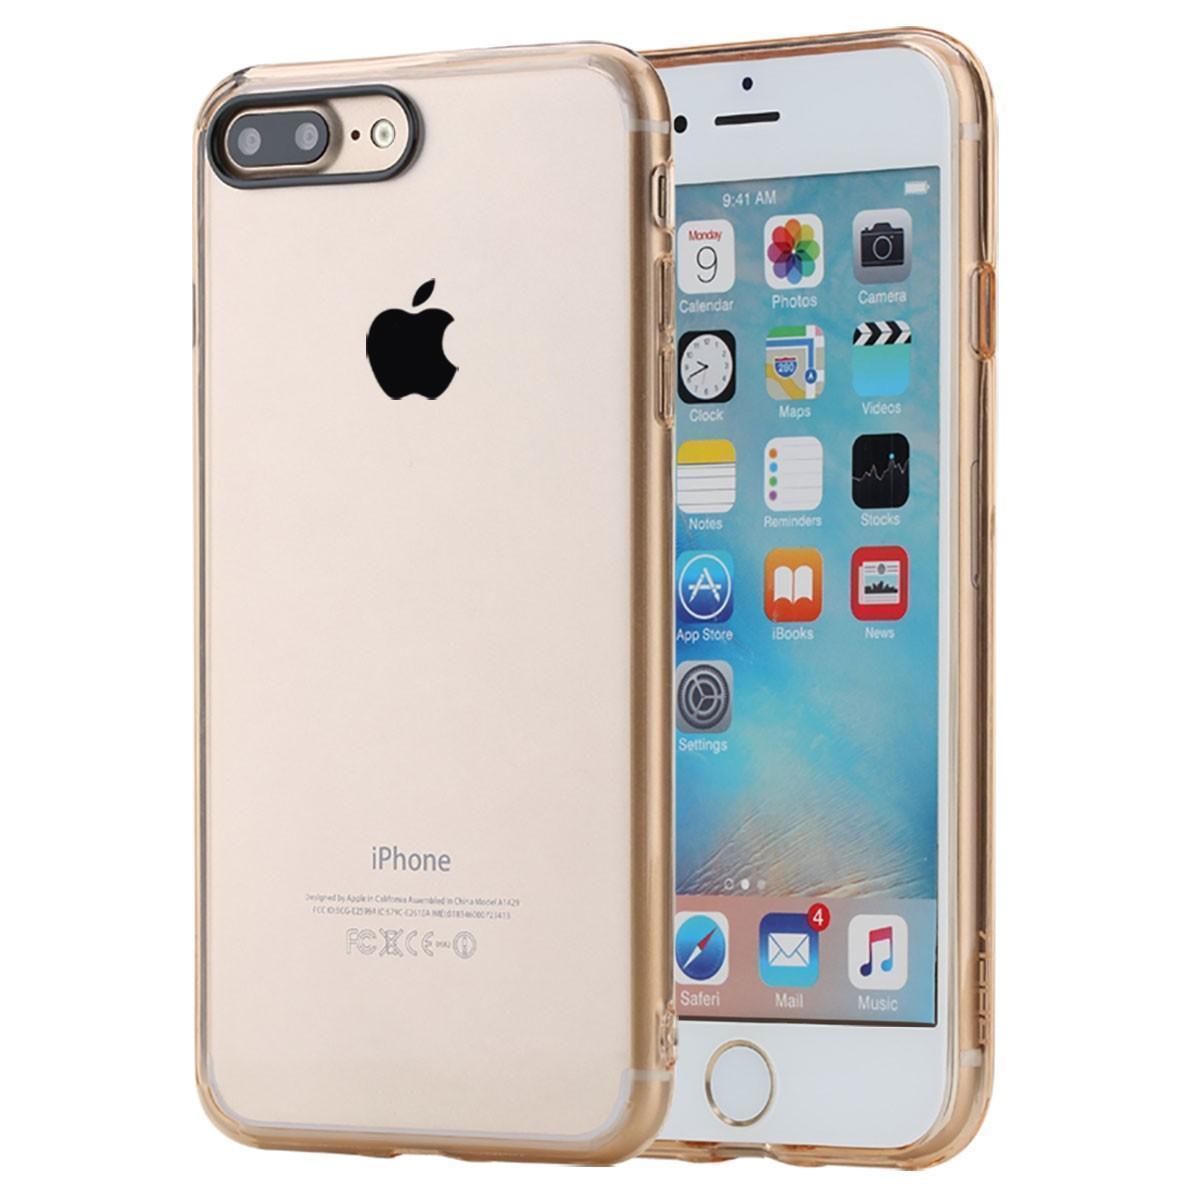 Чехол-накладка Rock Pure Series для Apple iPhone 7 Plus/8 Plus пластик-силикон прозрачно-золотойдля iPhone 7 Plus/8 Plus<br>Чехол-накладка Rock Pure Series для Apple iPhone 7 Plus/8 Plus пластик-силикон прозрачно-золотой<br>